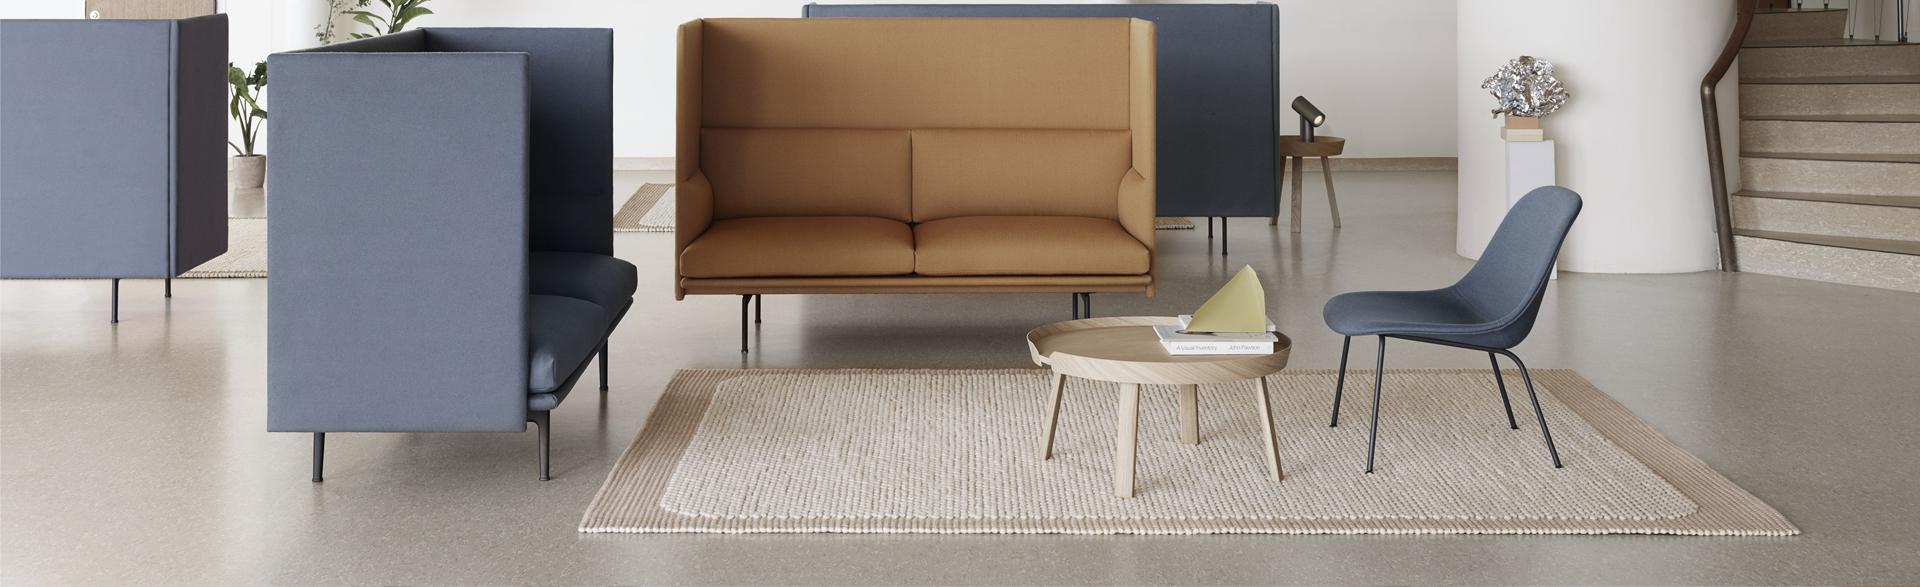 toni m ller wohnkultur muttenz basel m bel design innenarchitektur wohnen. Black Bedroom Furniture Sets. Home Design Ideas